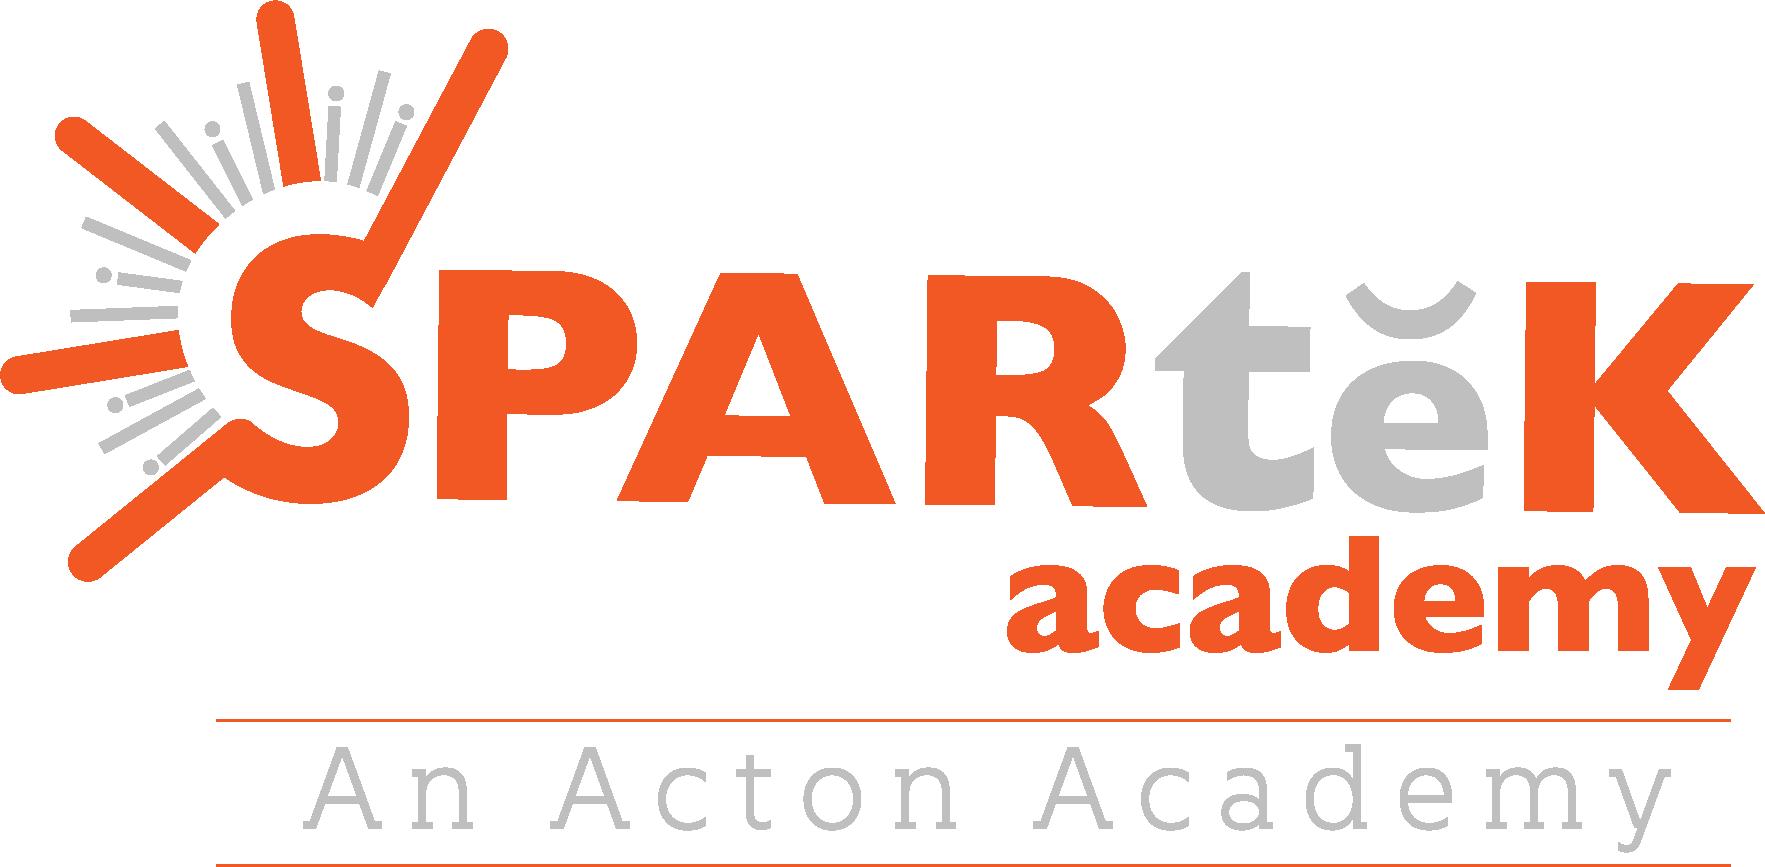 Spartek Academy   An Acton Academy